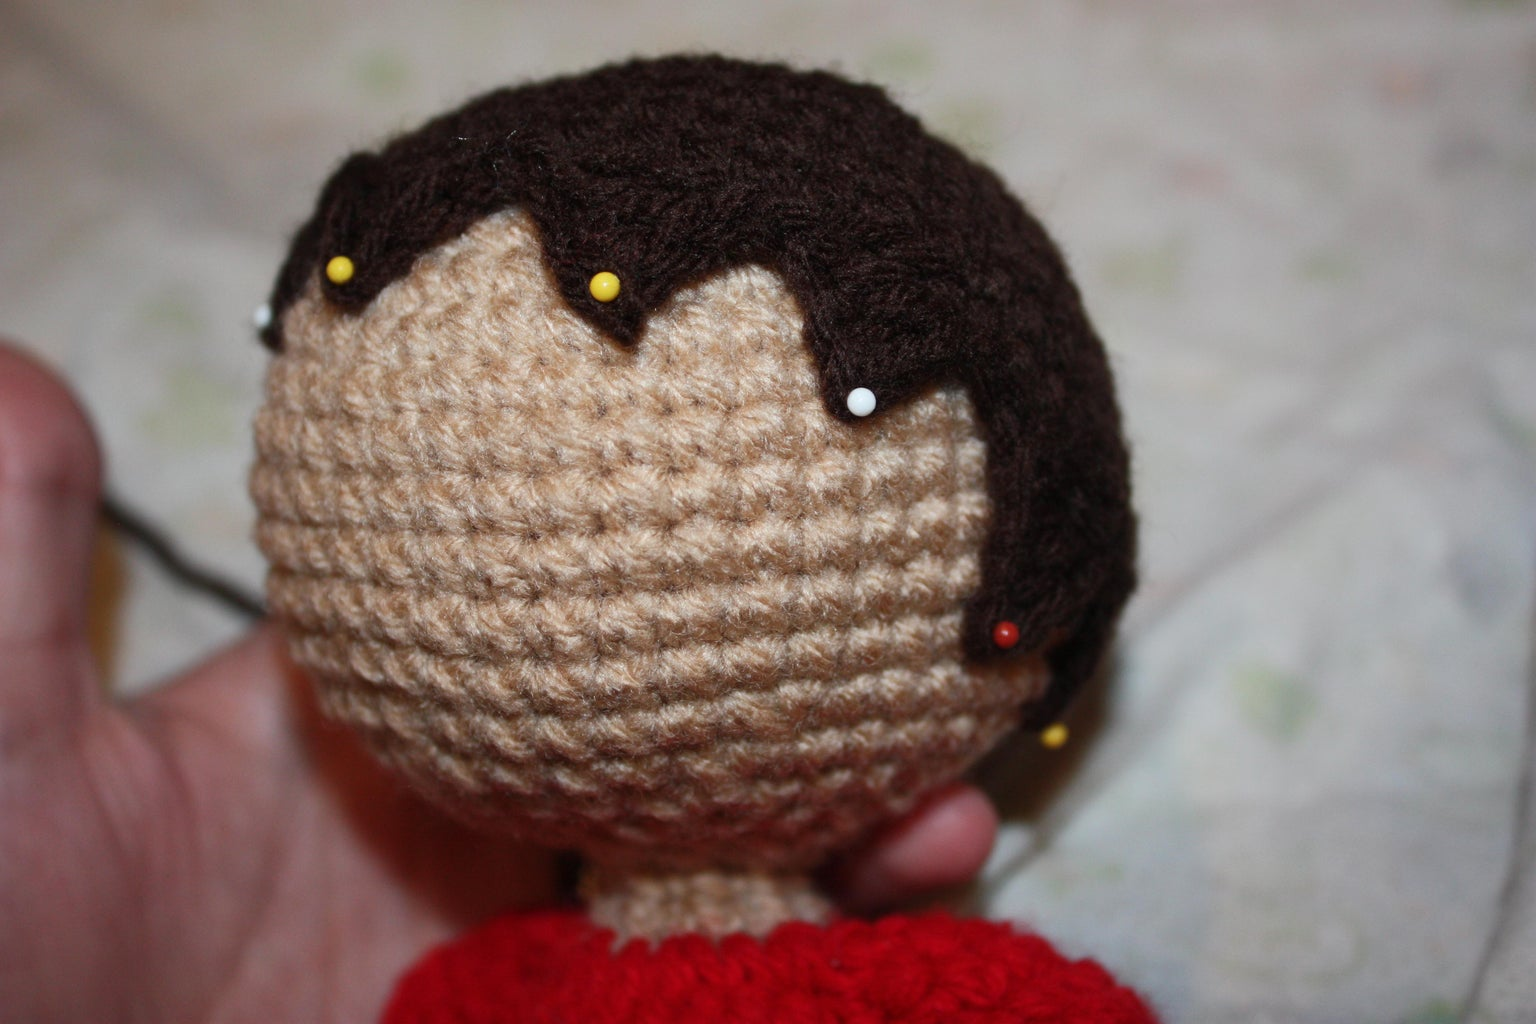 Step 4: Hair and Ears